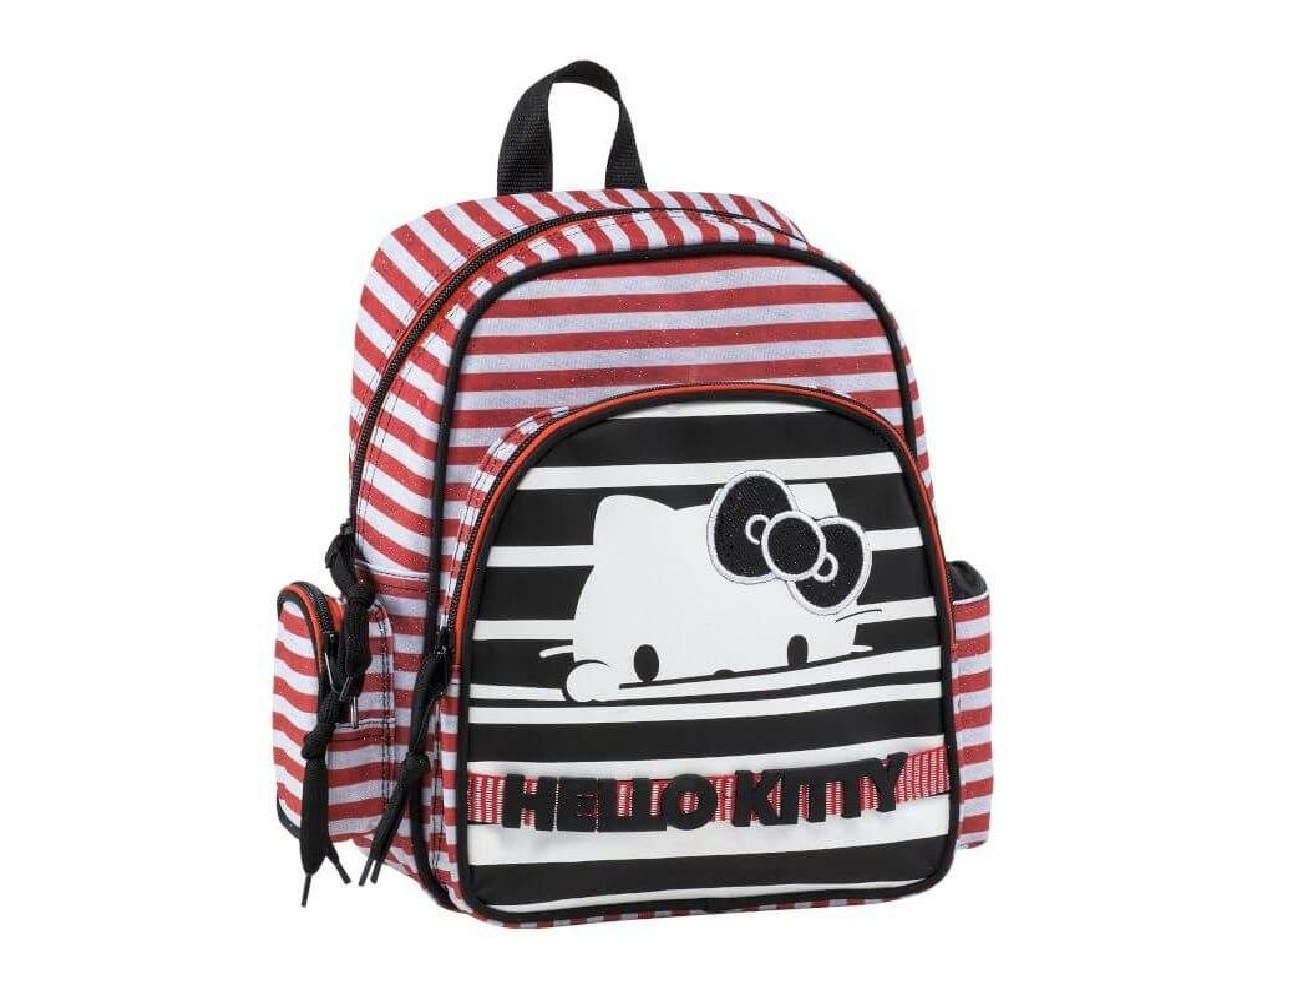 285a4ea493 Σακίδιο Νηπιαγωγείου Hidden Stripes - Hello Kitty - 188292 - Lexicon ...